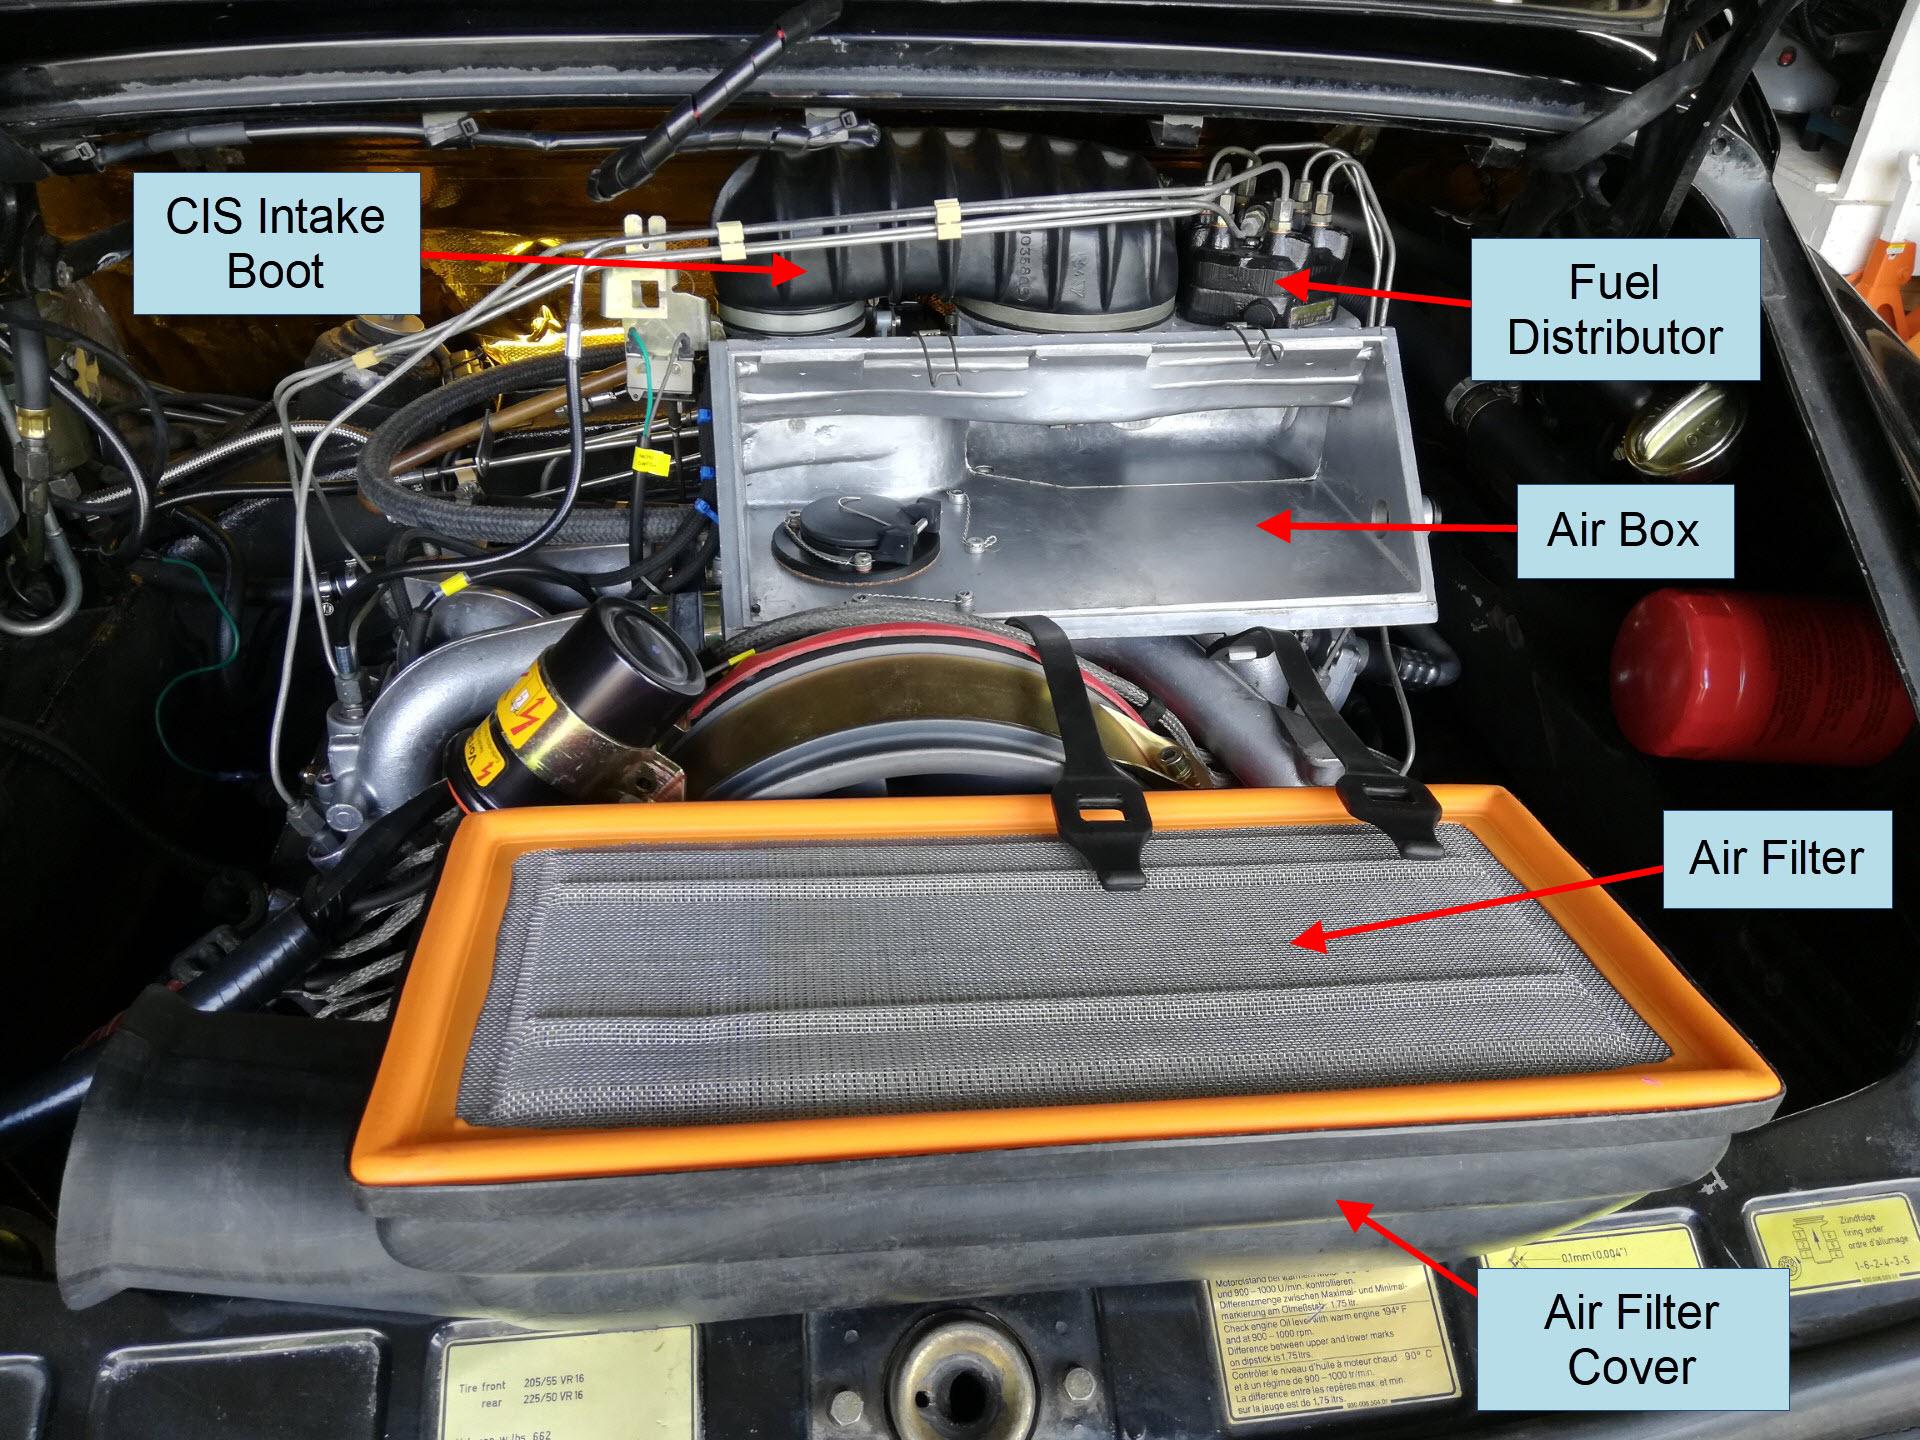 Air-cooled Porsche 911 airbox fuel distributor